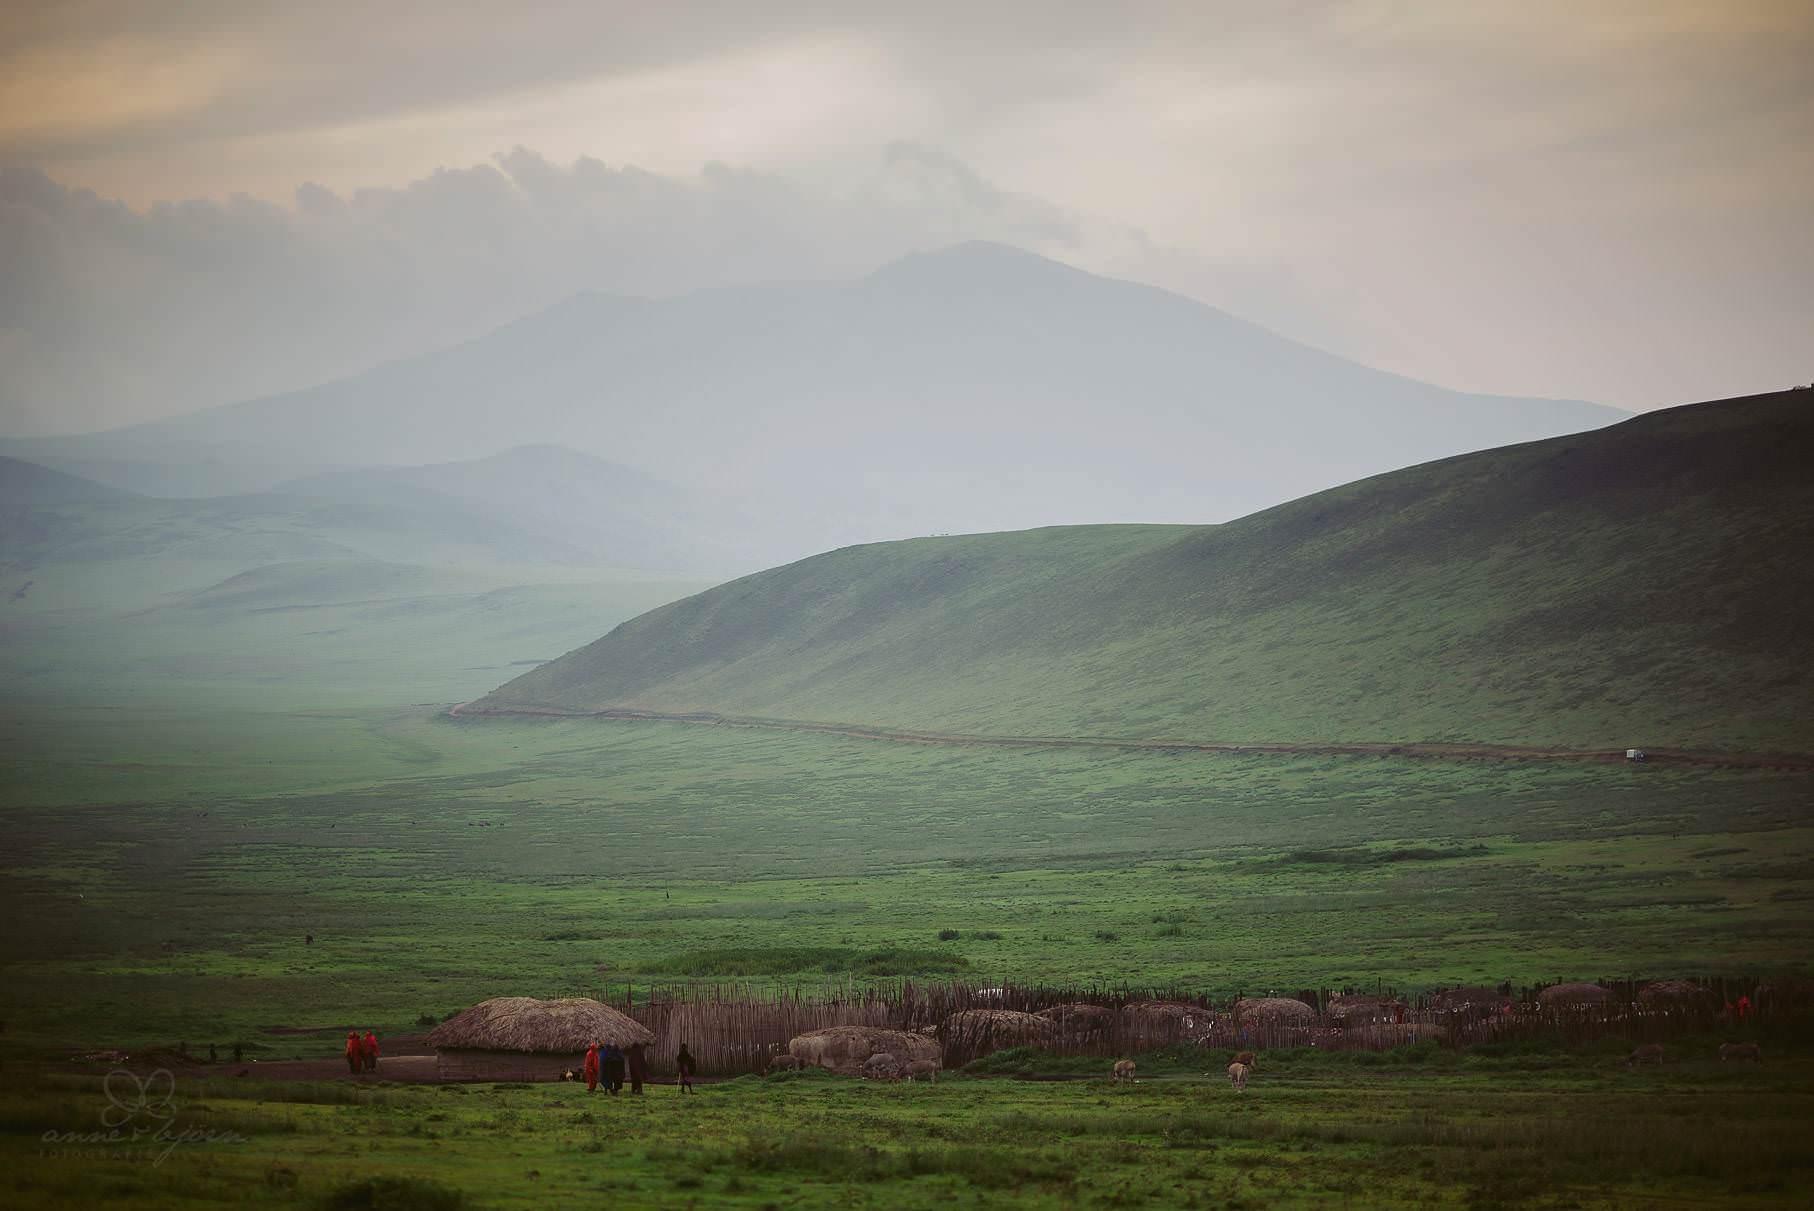 0045 tansania nd6 7687 anne bjoern fotografie hochzeitsfotograf hamburg - This is Tanzania - Serengeti, Kilimanjaro & Sansibar